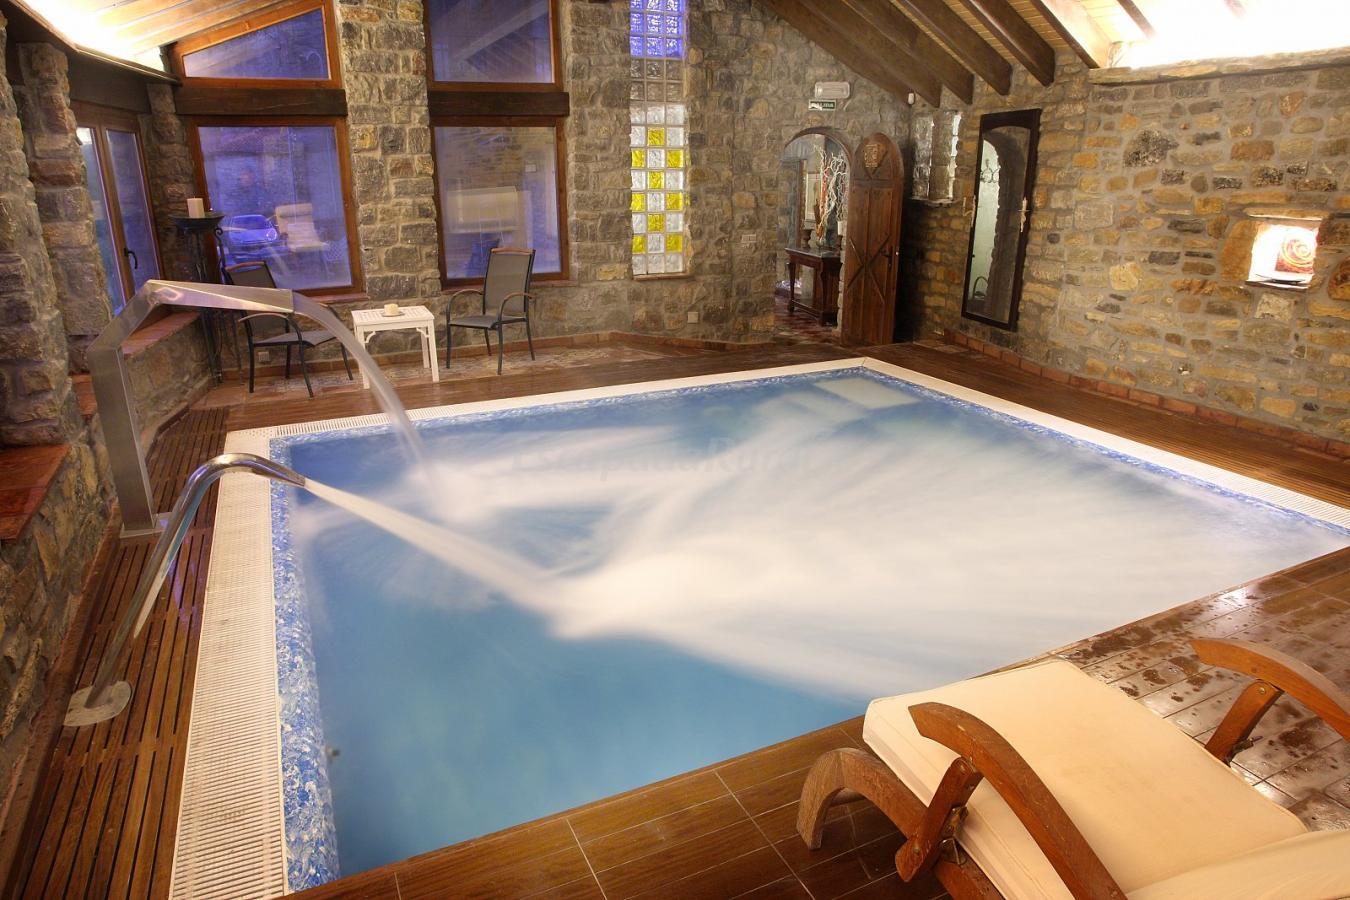 Fotos de apartamentos castillo de piedrasecha casa rural en piedrasecha le n - Casa rural piscina climatizada interior ...